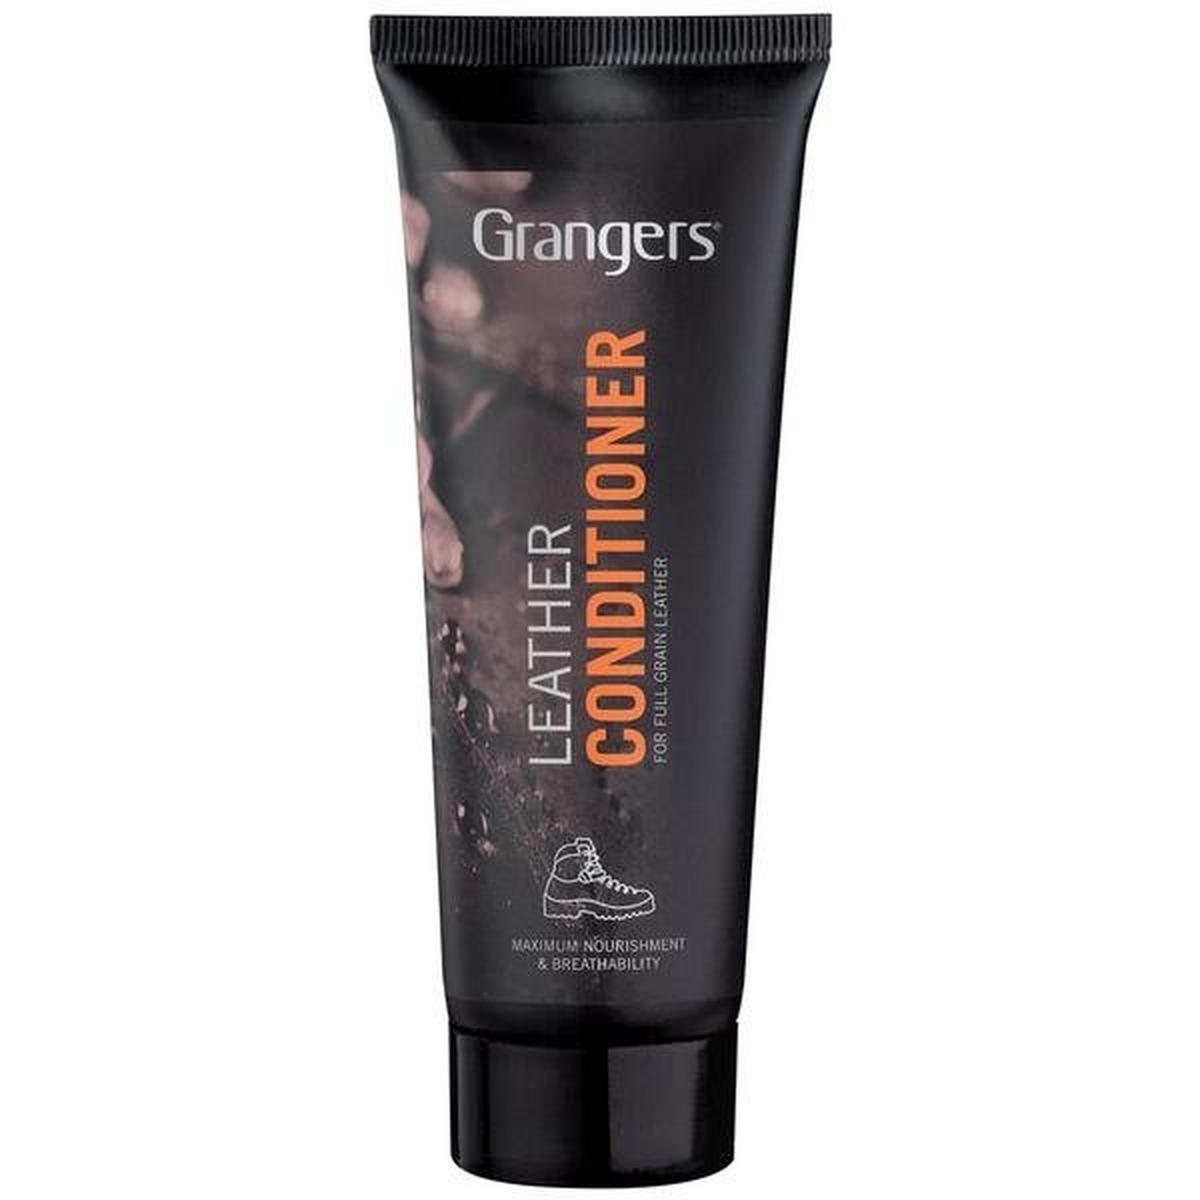 Grangers Granger's Boot Care: Leather Conditioner 75ml Tube